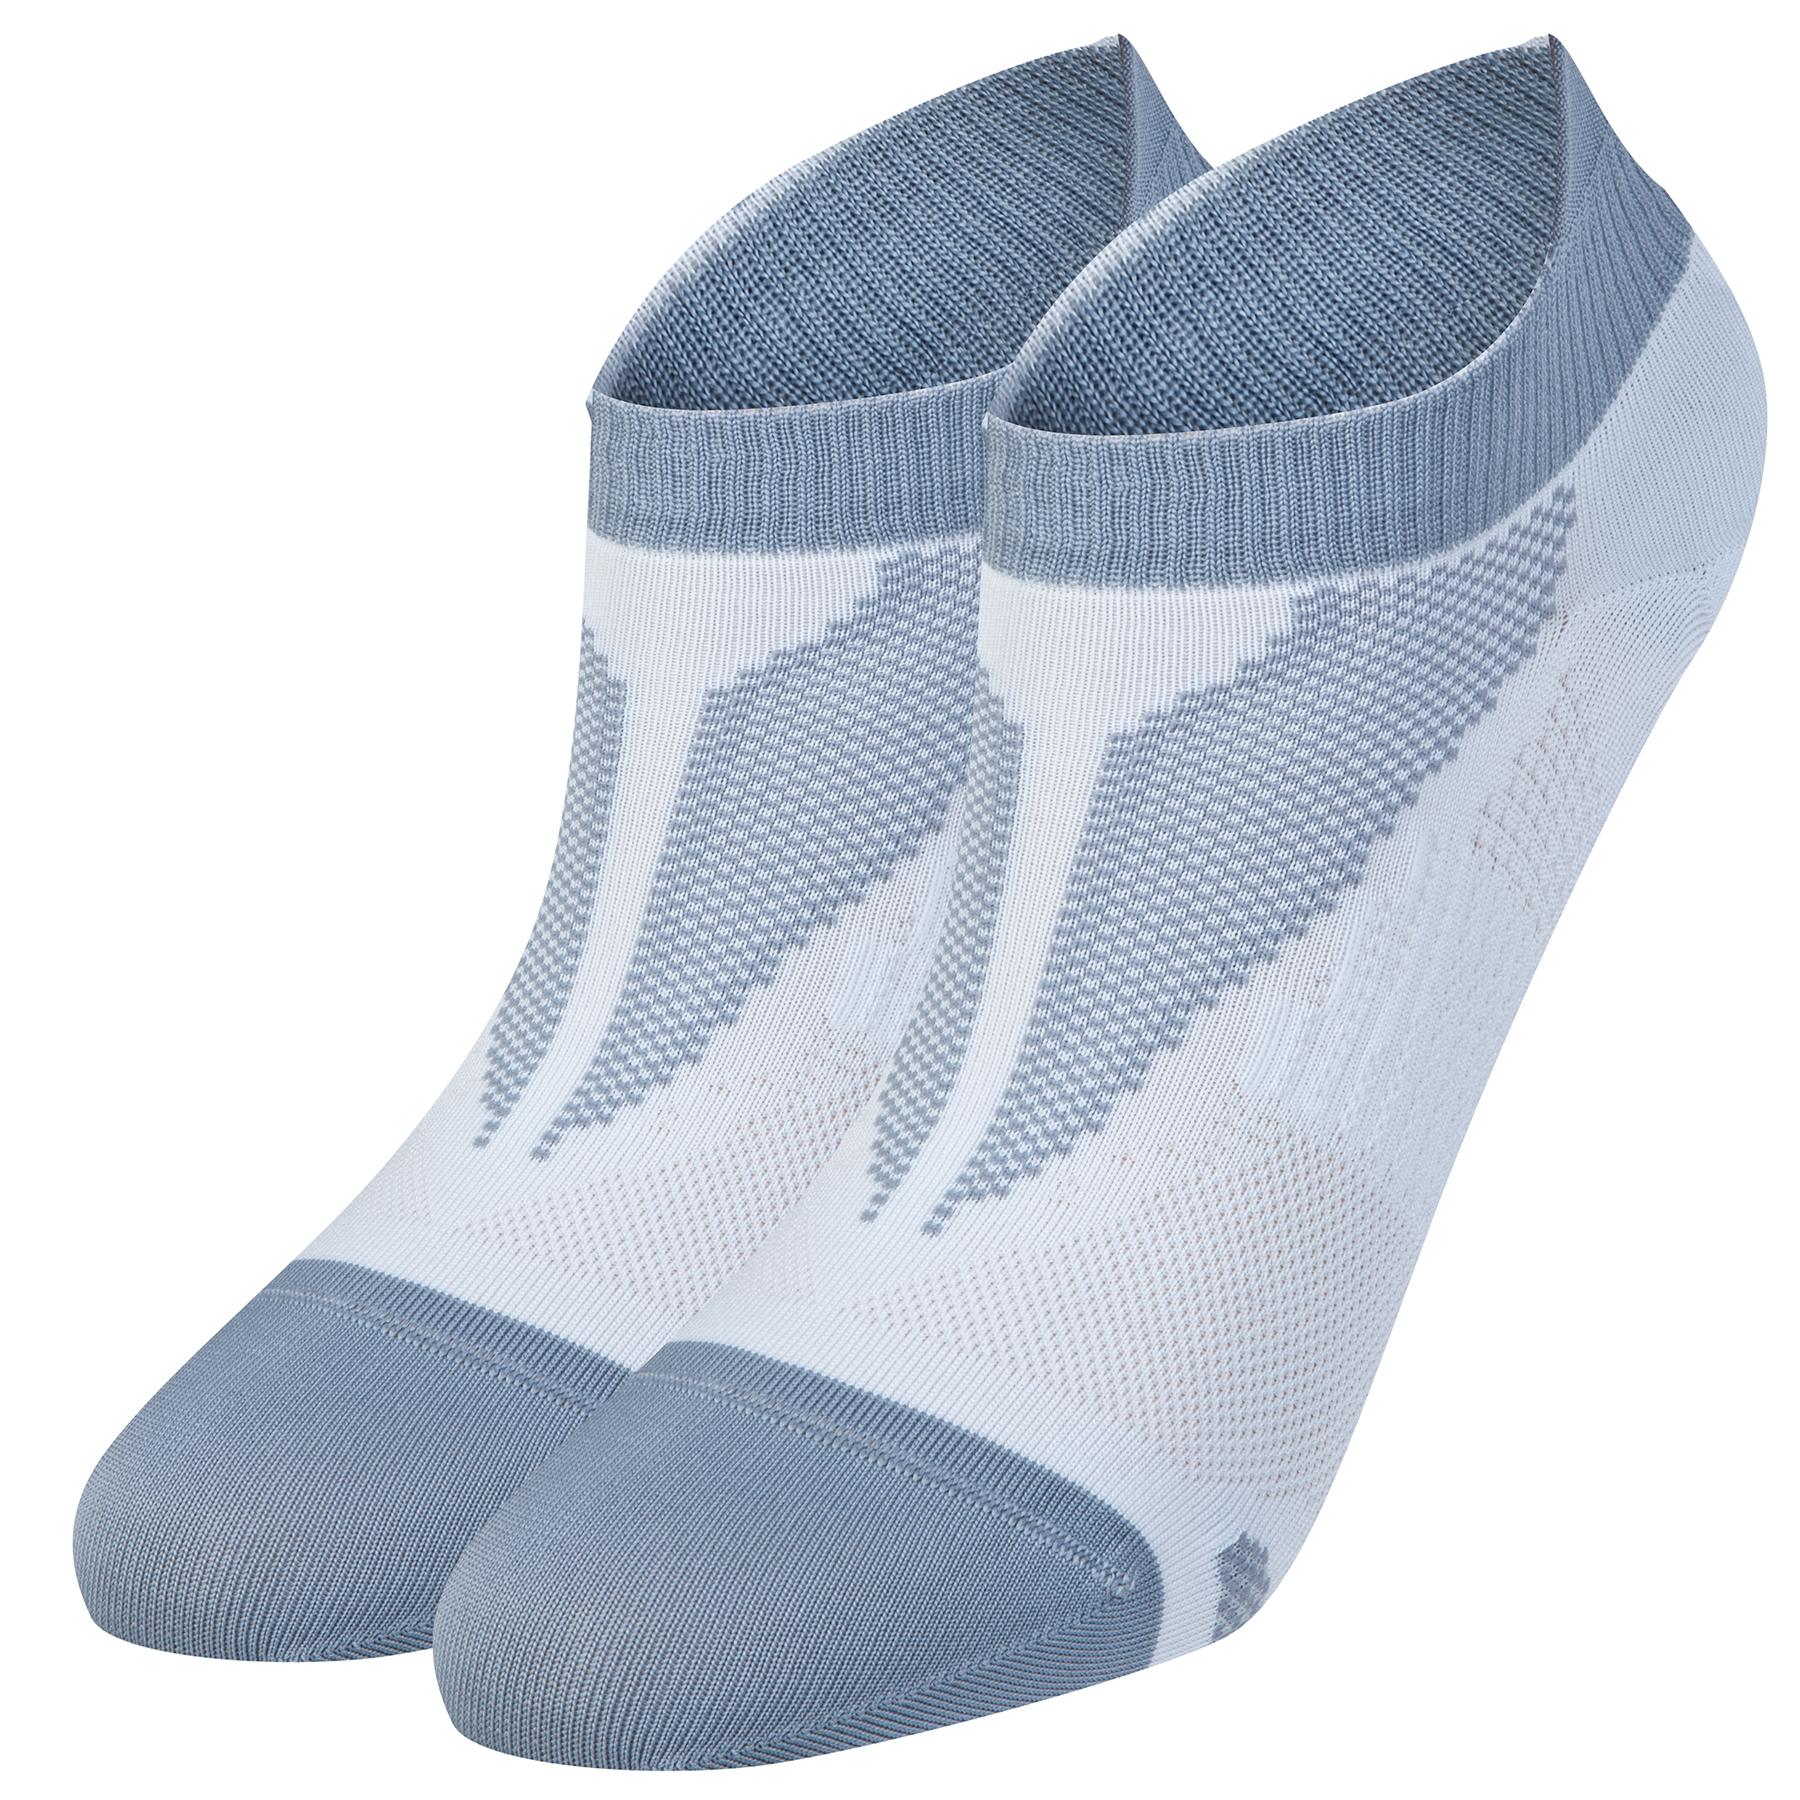 Nike Elite Run Lightweight No Show Socks White